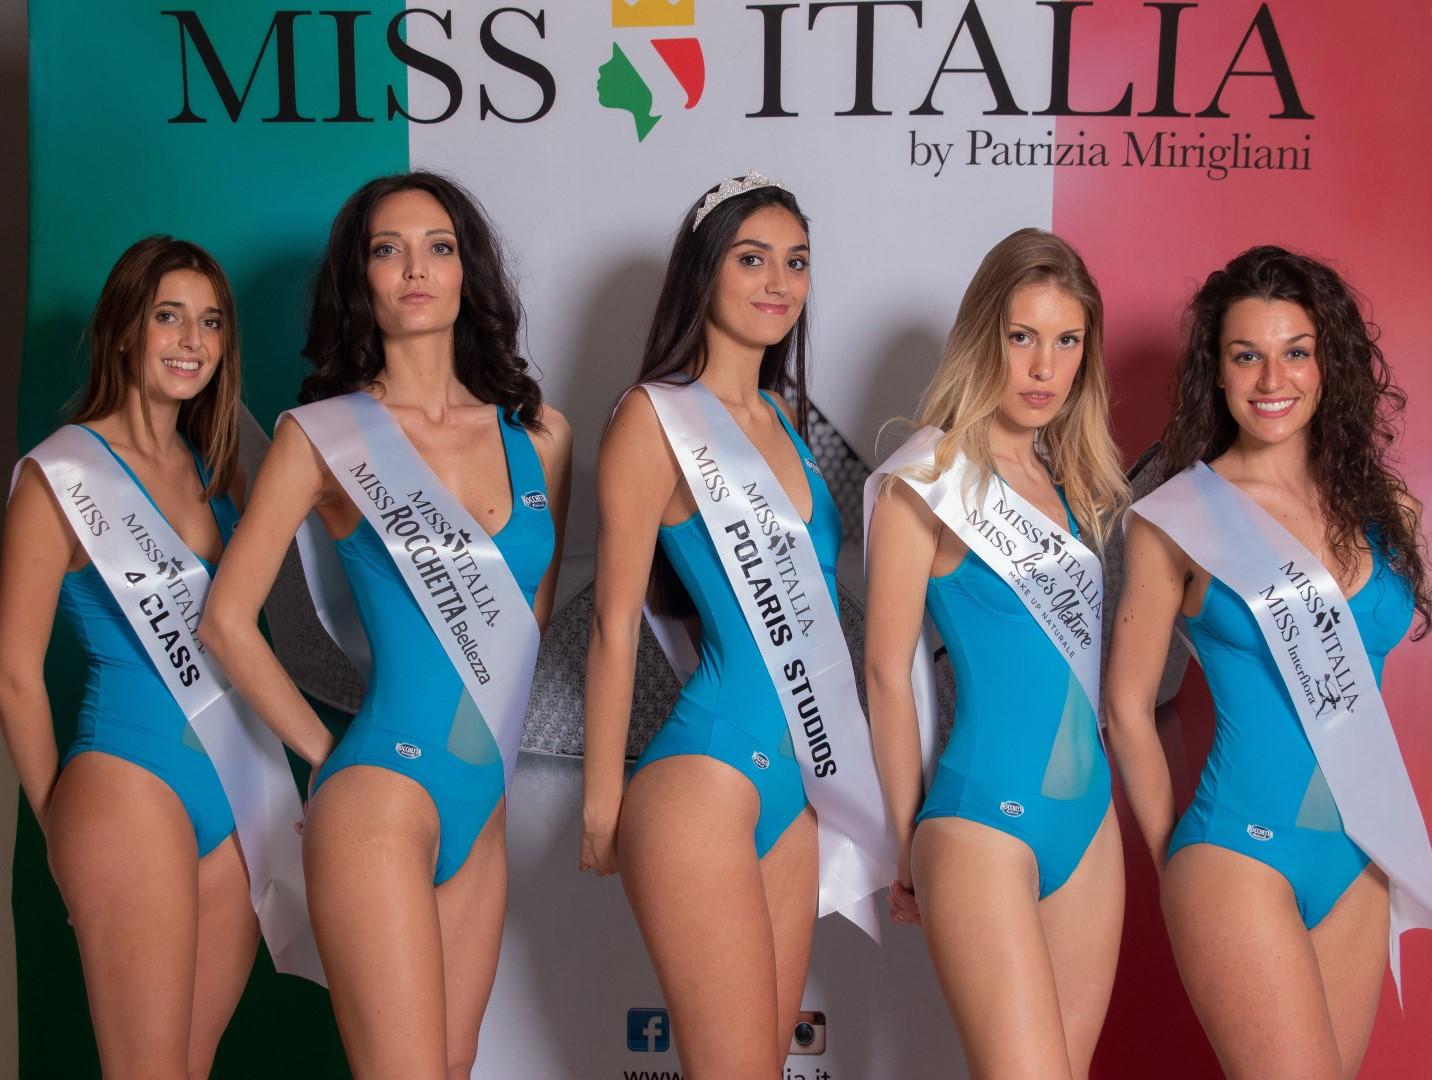 Miss Polaris Studios ECCO LE FINALISTE